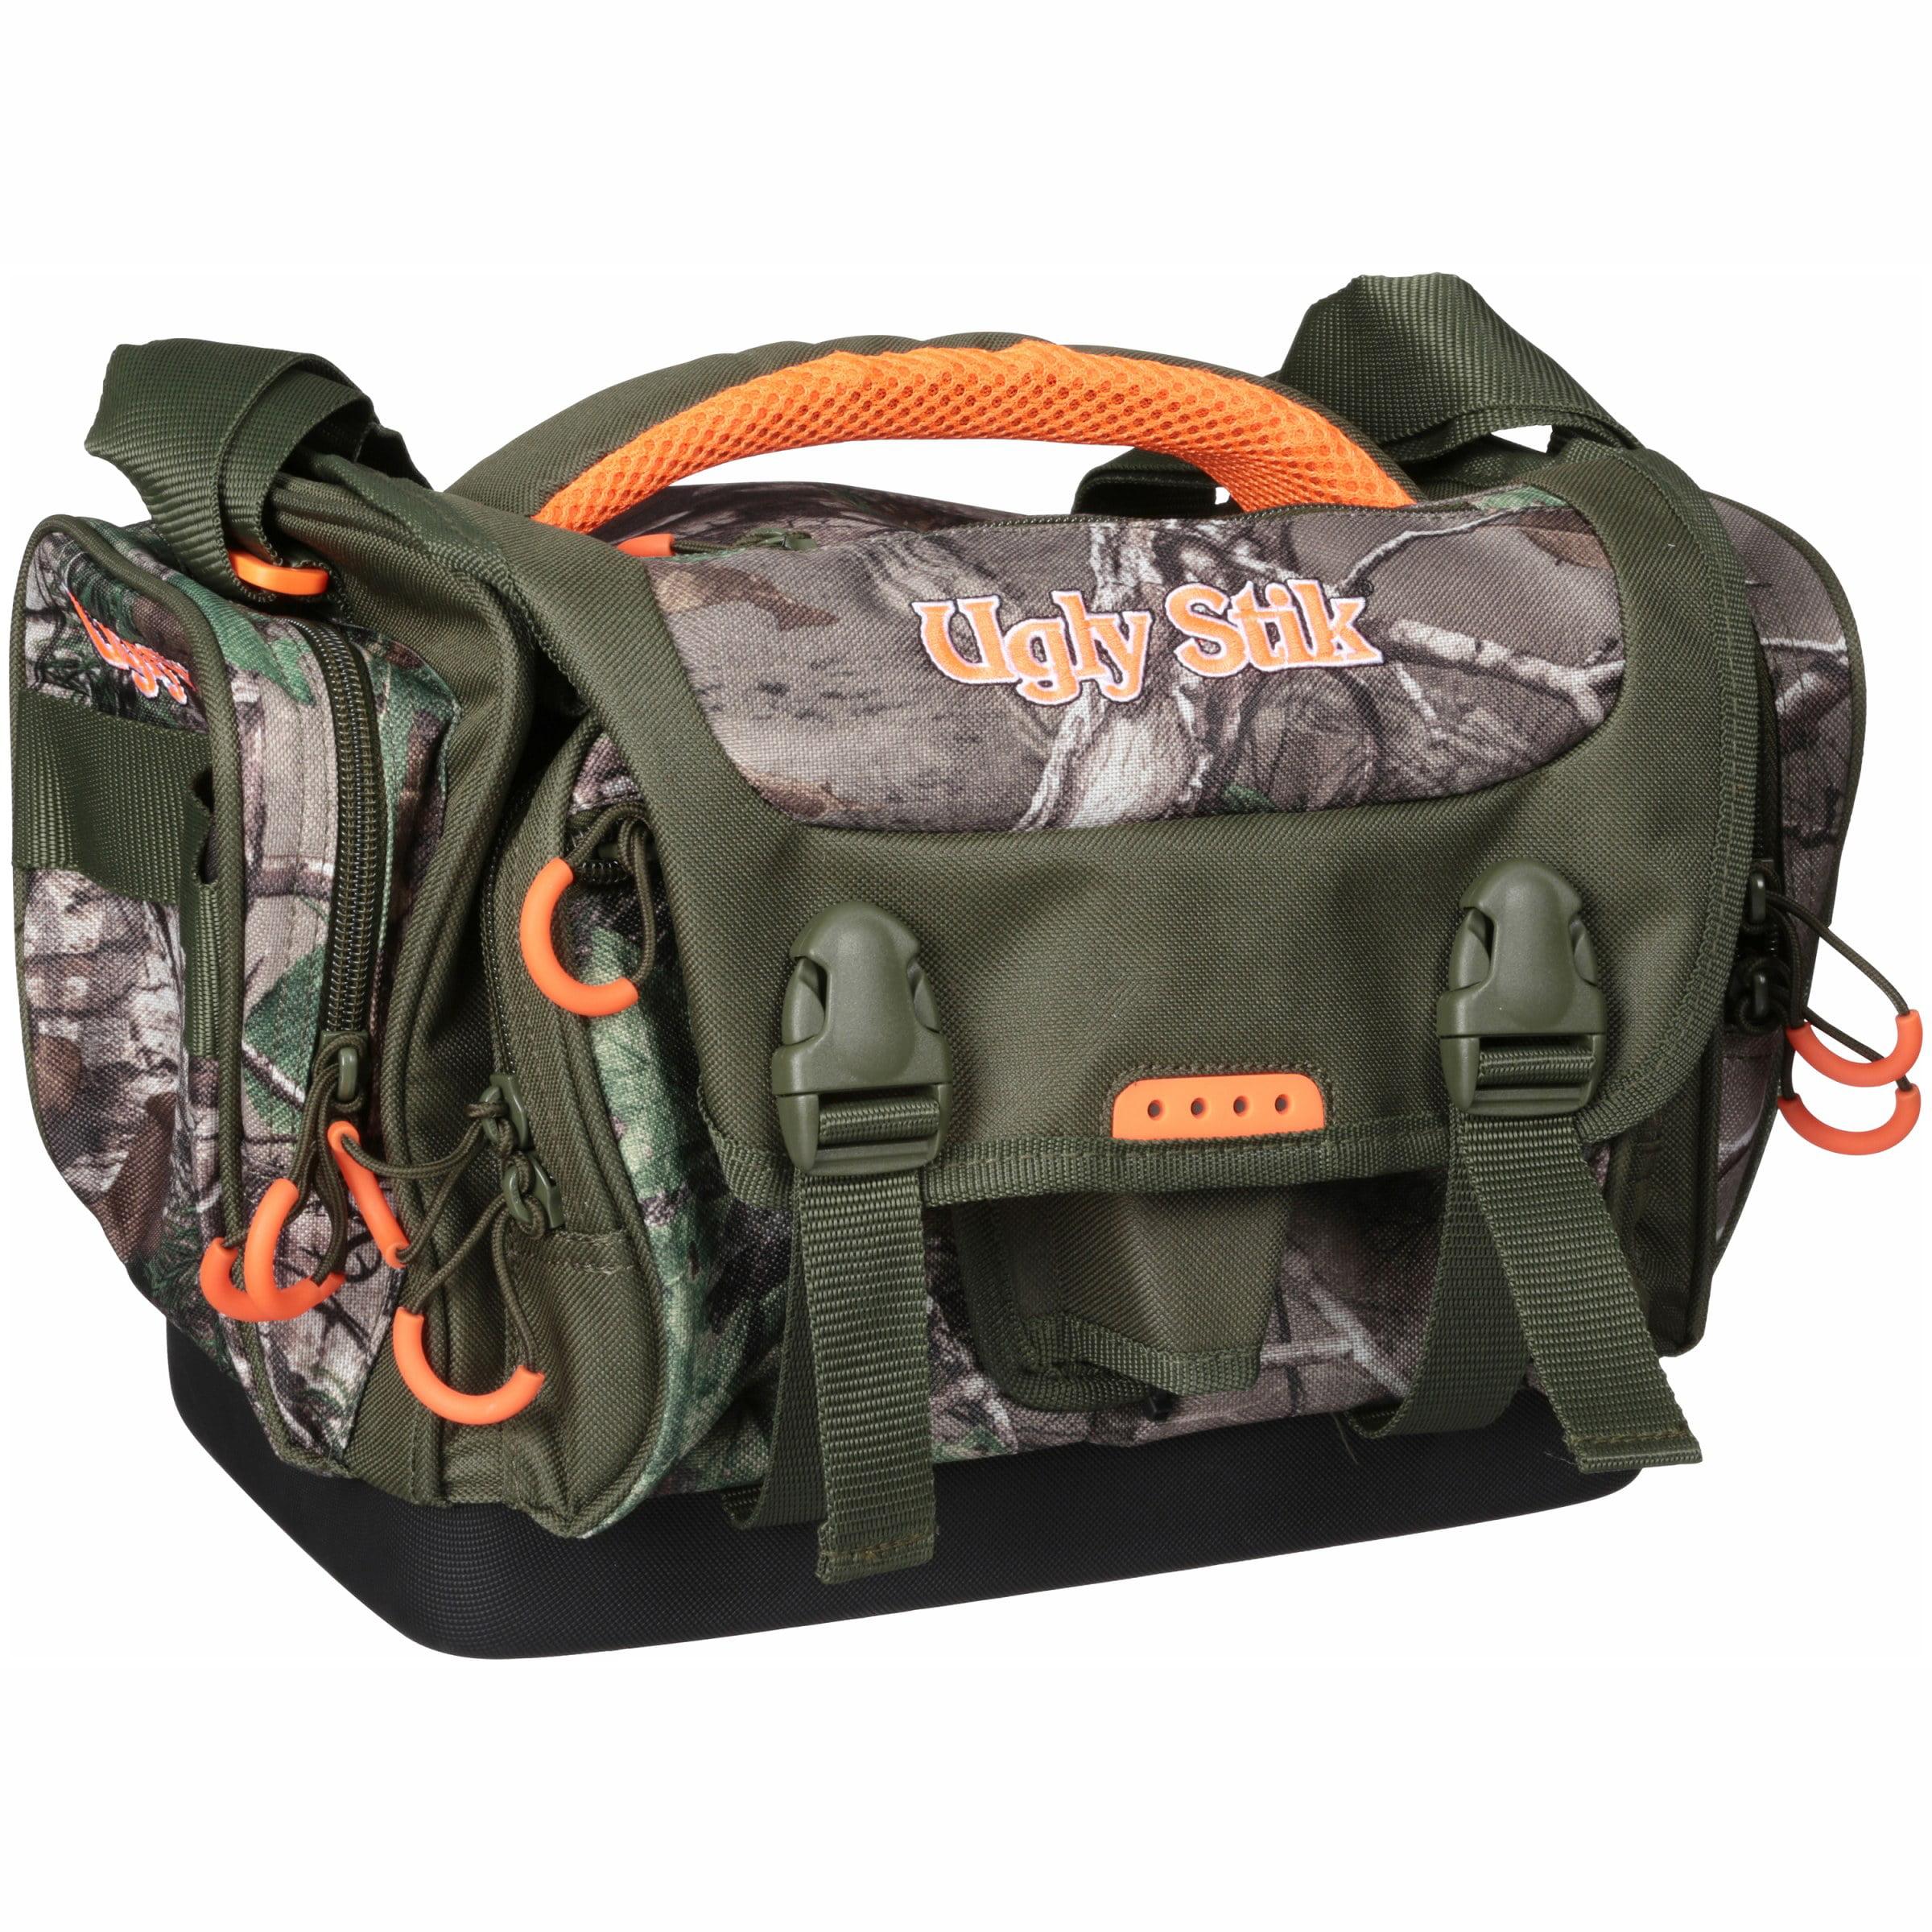 Ugly Stik Realtree Camo Tackle Bag by Jordan Outdoor Enterprises, LTD.